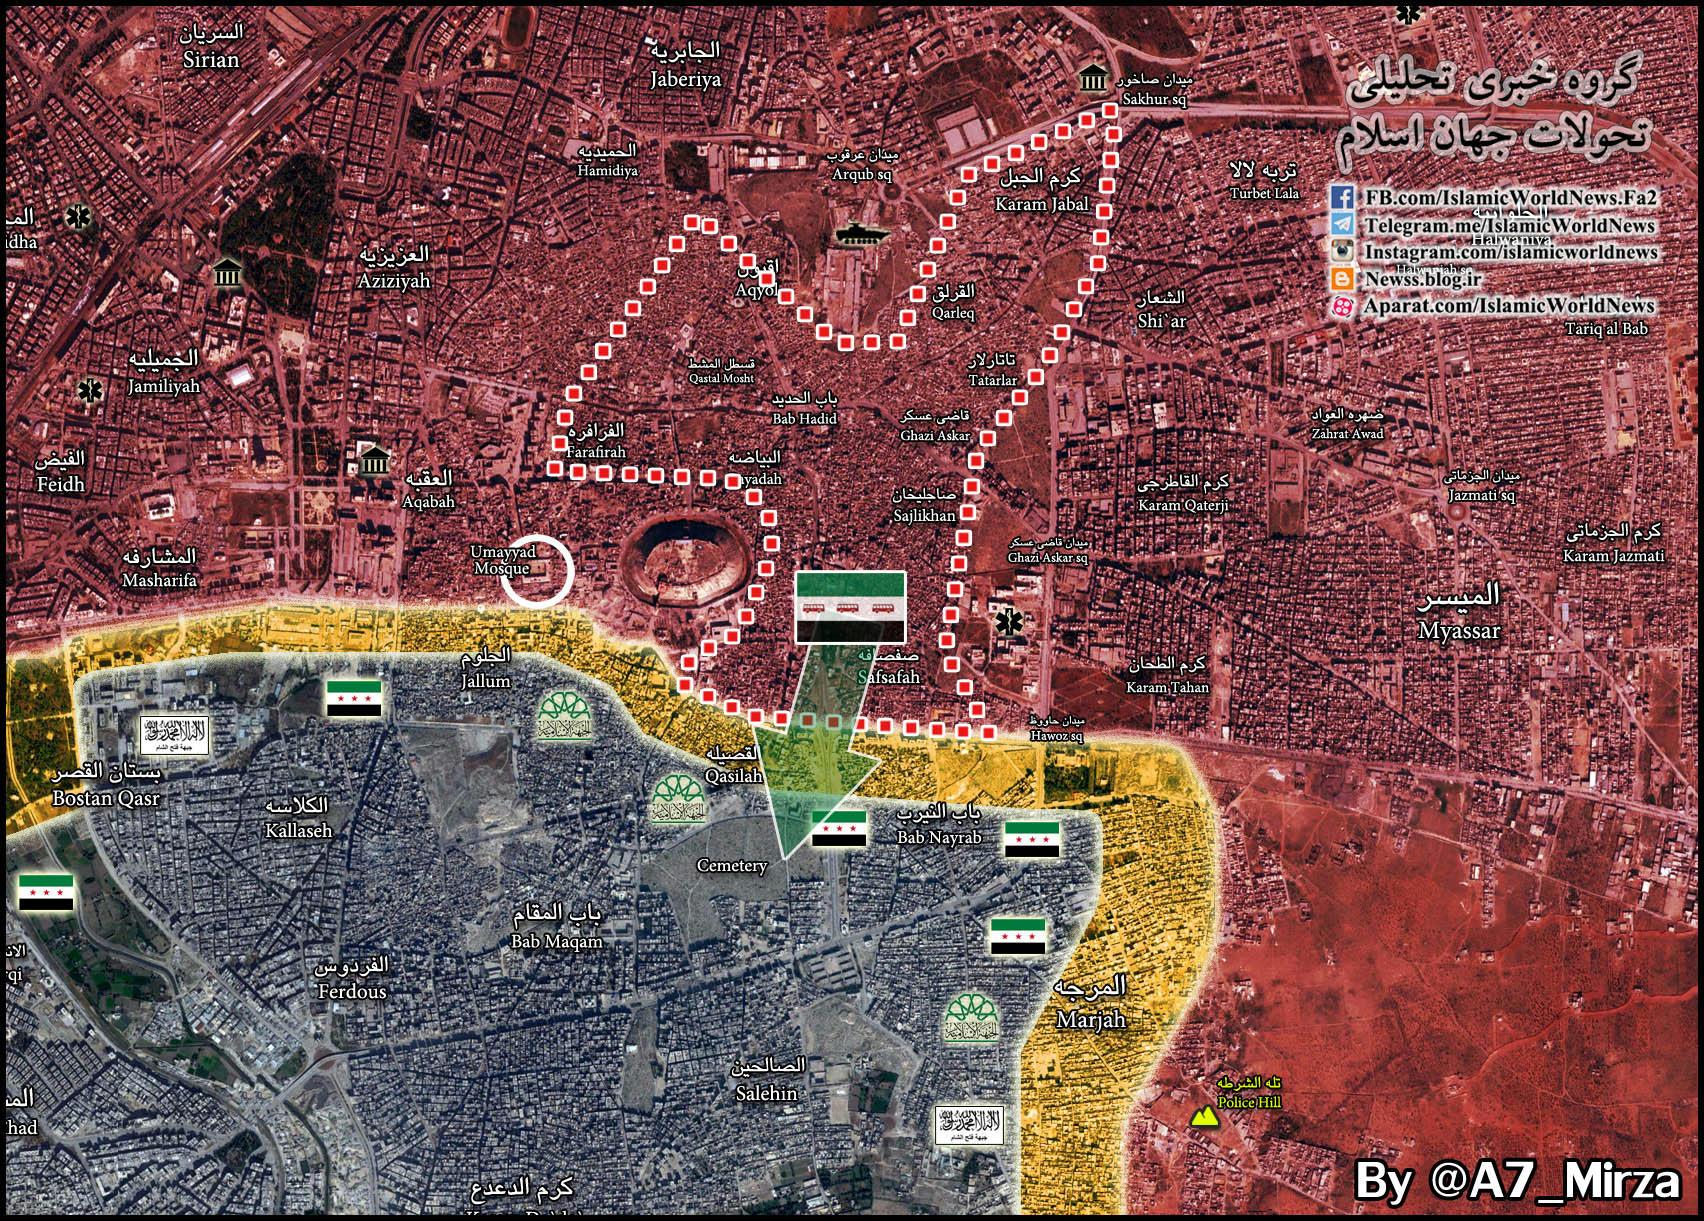 Syrian Civil War: News #10 - Page 30 6iitiparkbj5akazg